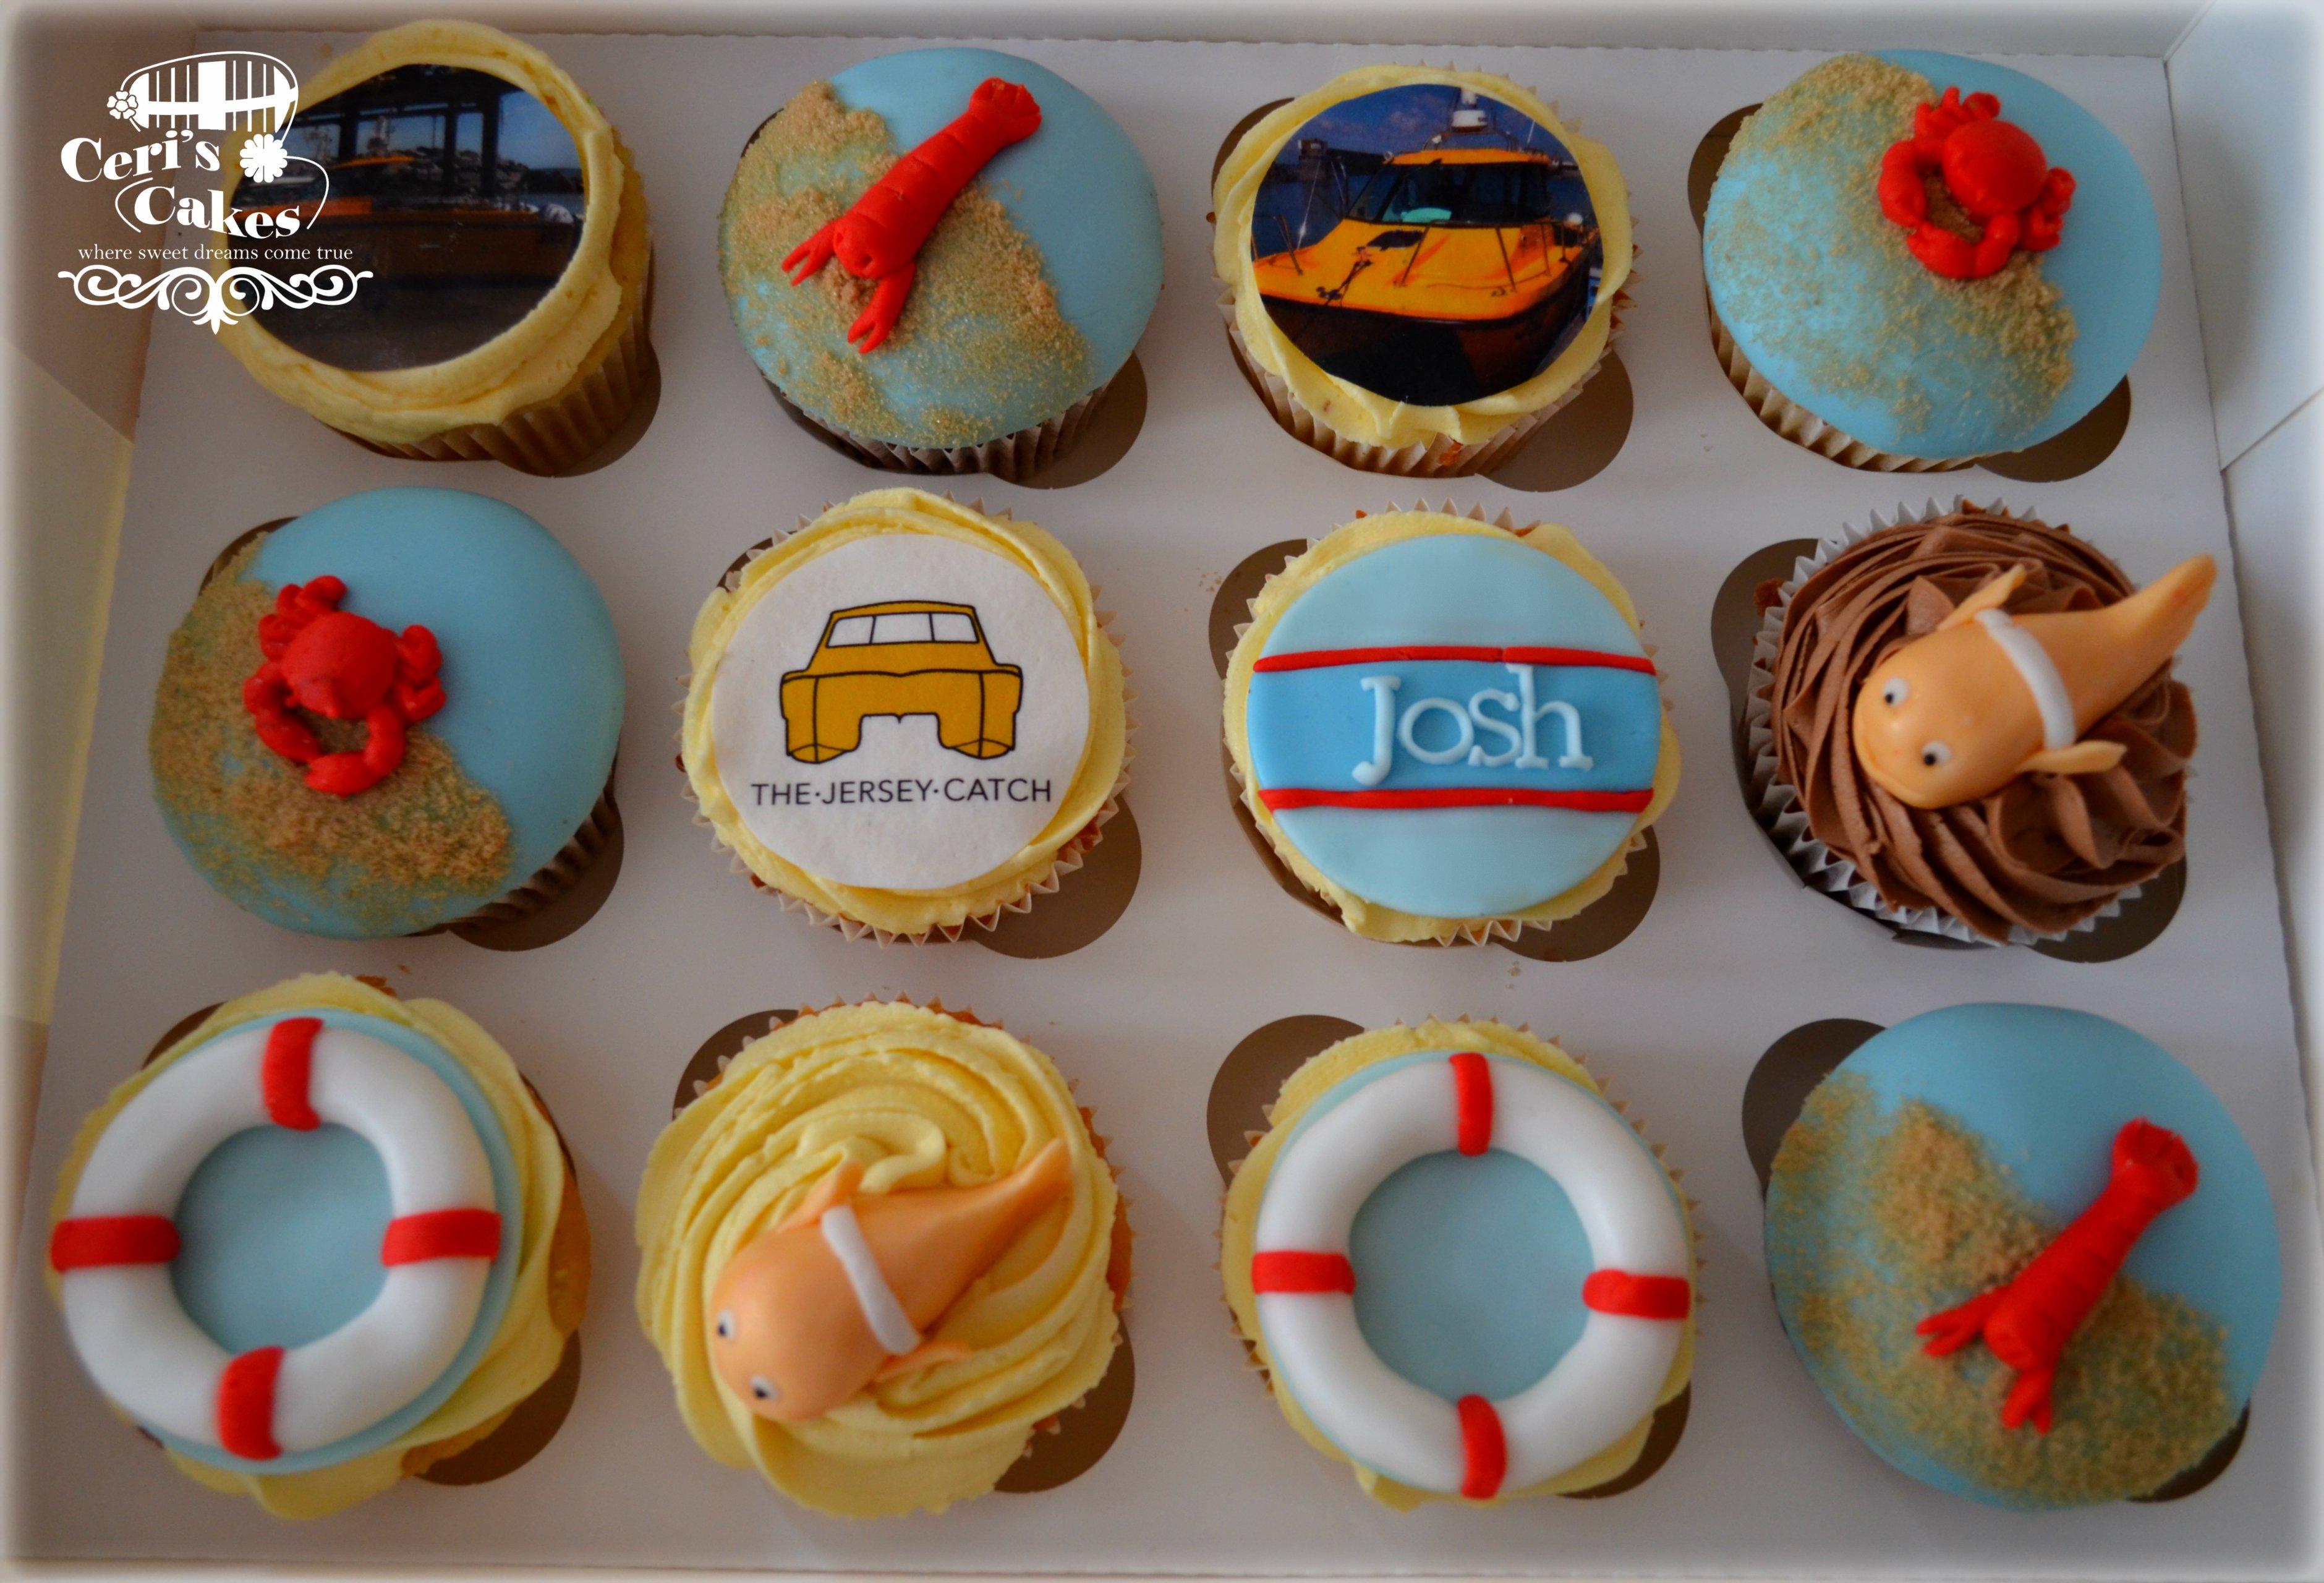 Cupake Designs St Helier Jersey Ceri S Cakes